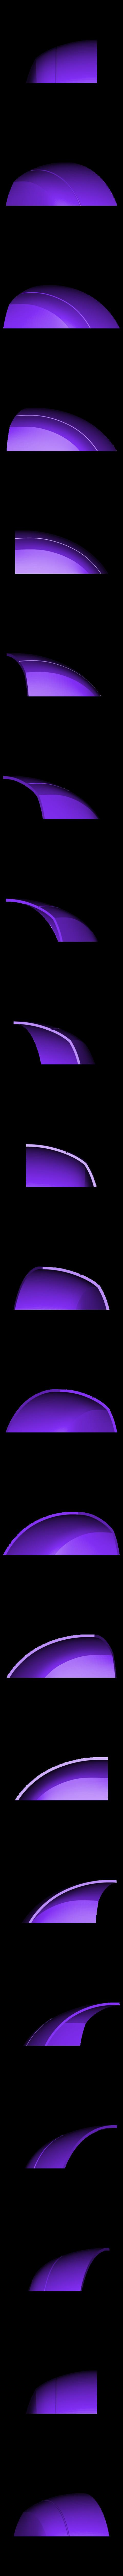 Part_14_v2.stl Download free STL file Red Hood Helmet (Batman) with Details • Template to 3D print, VillainousPropShop